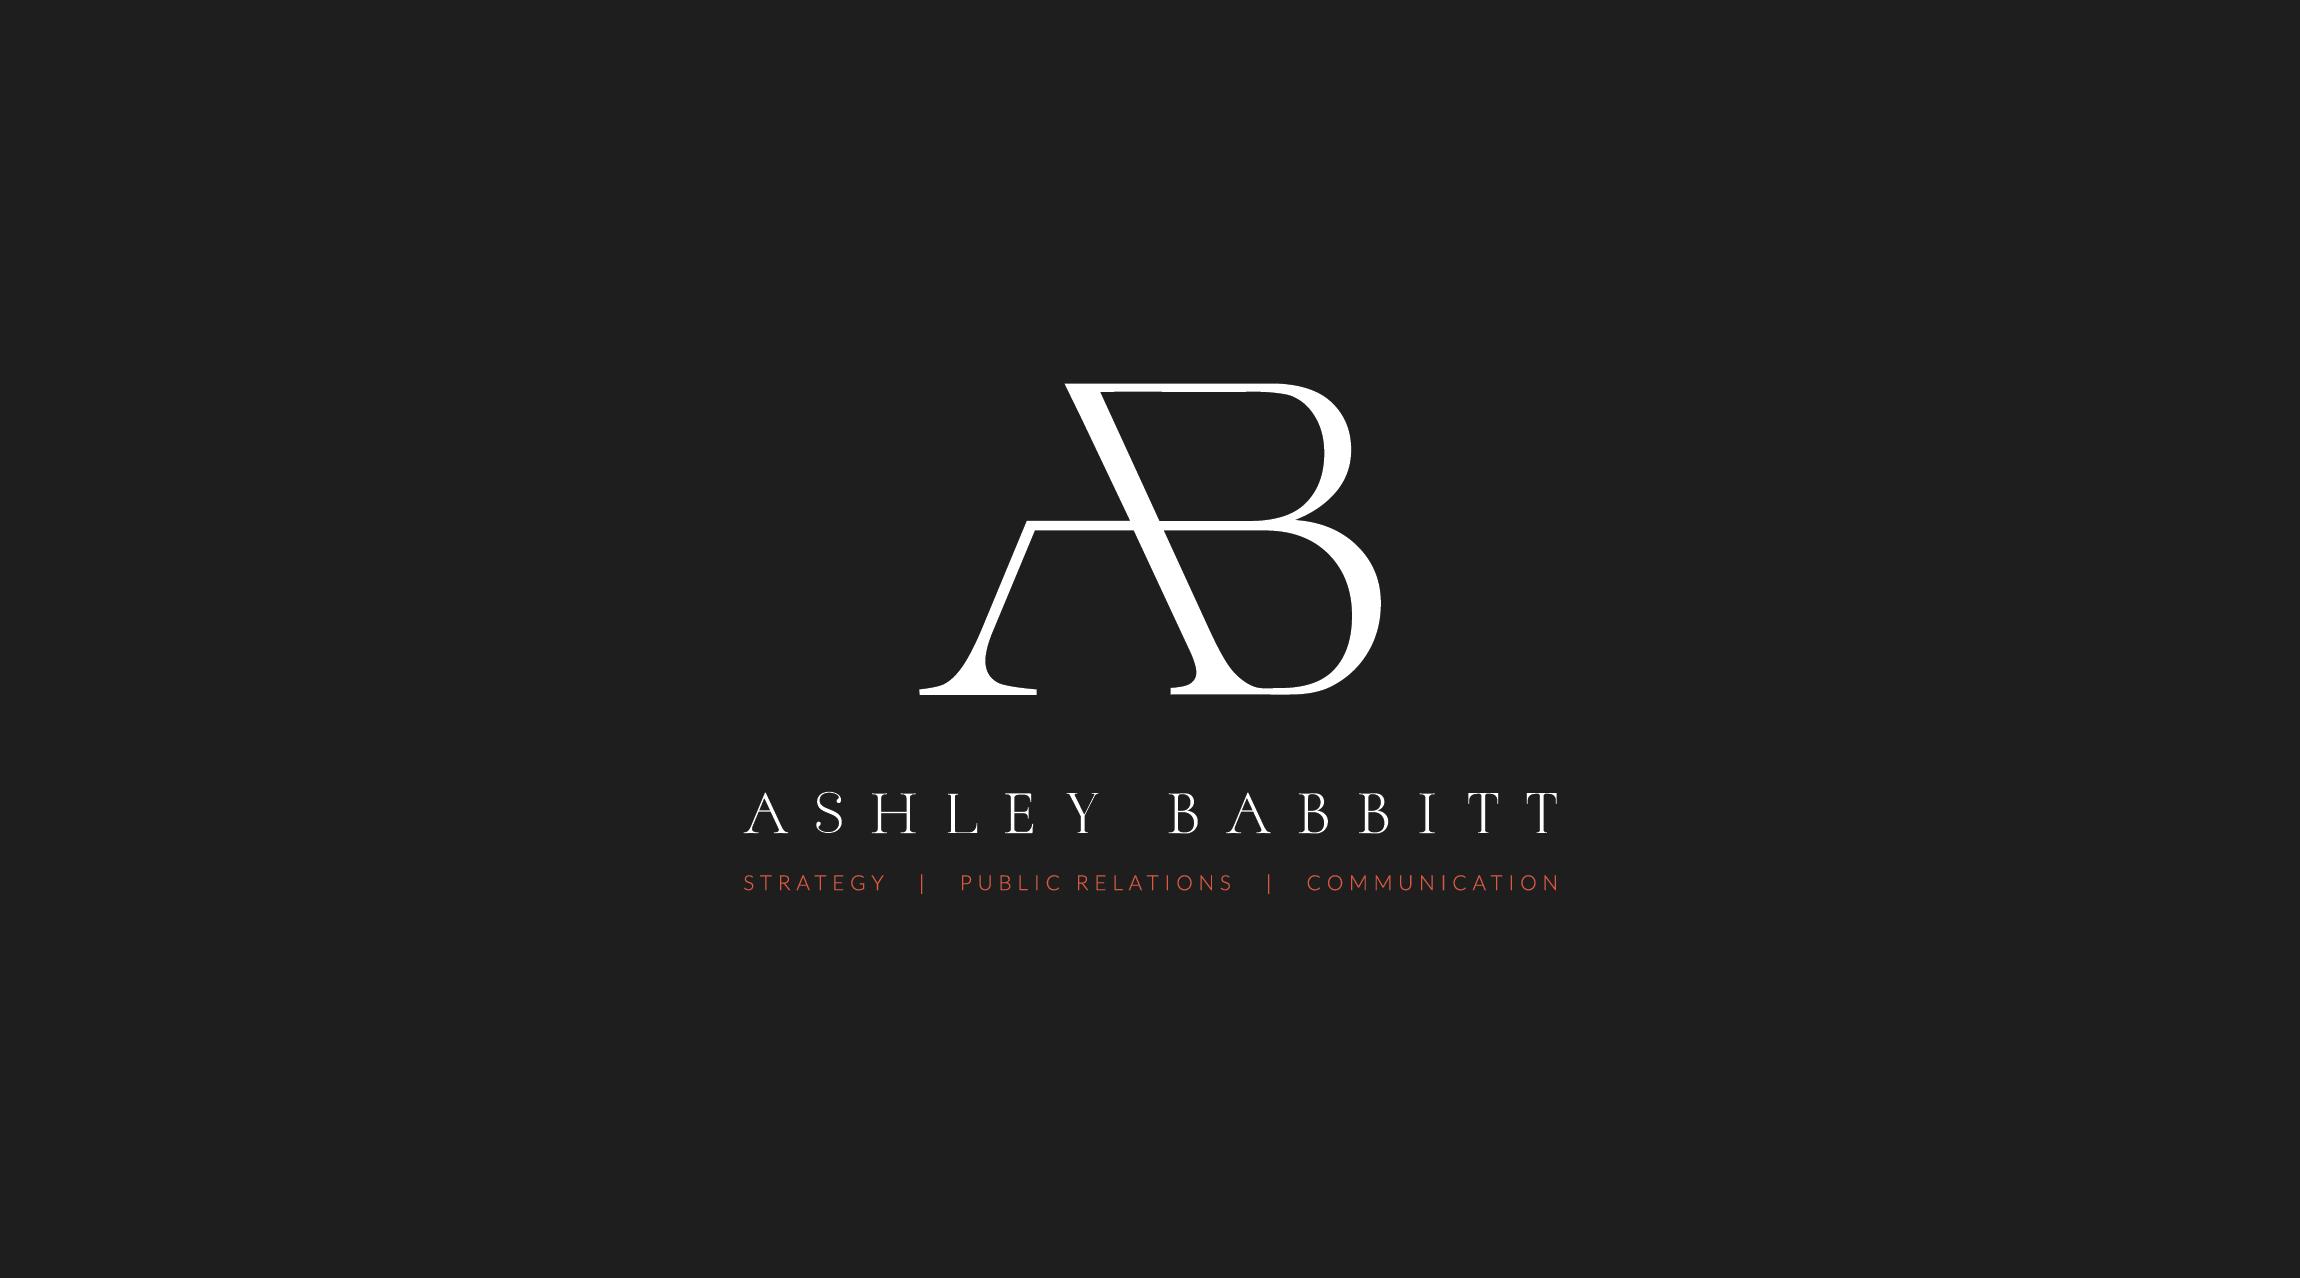 Ashley Babbitt Logo Design Branding Treadaway Co Design.png